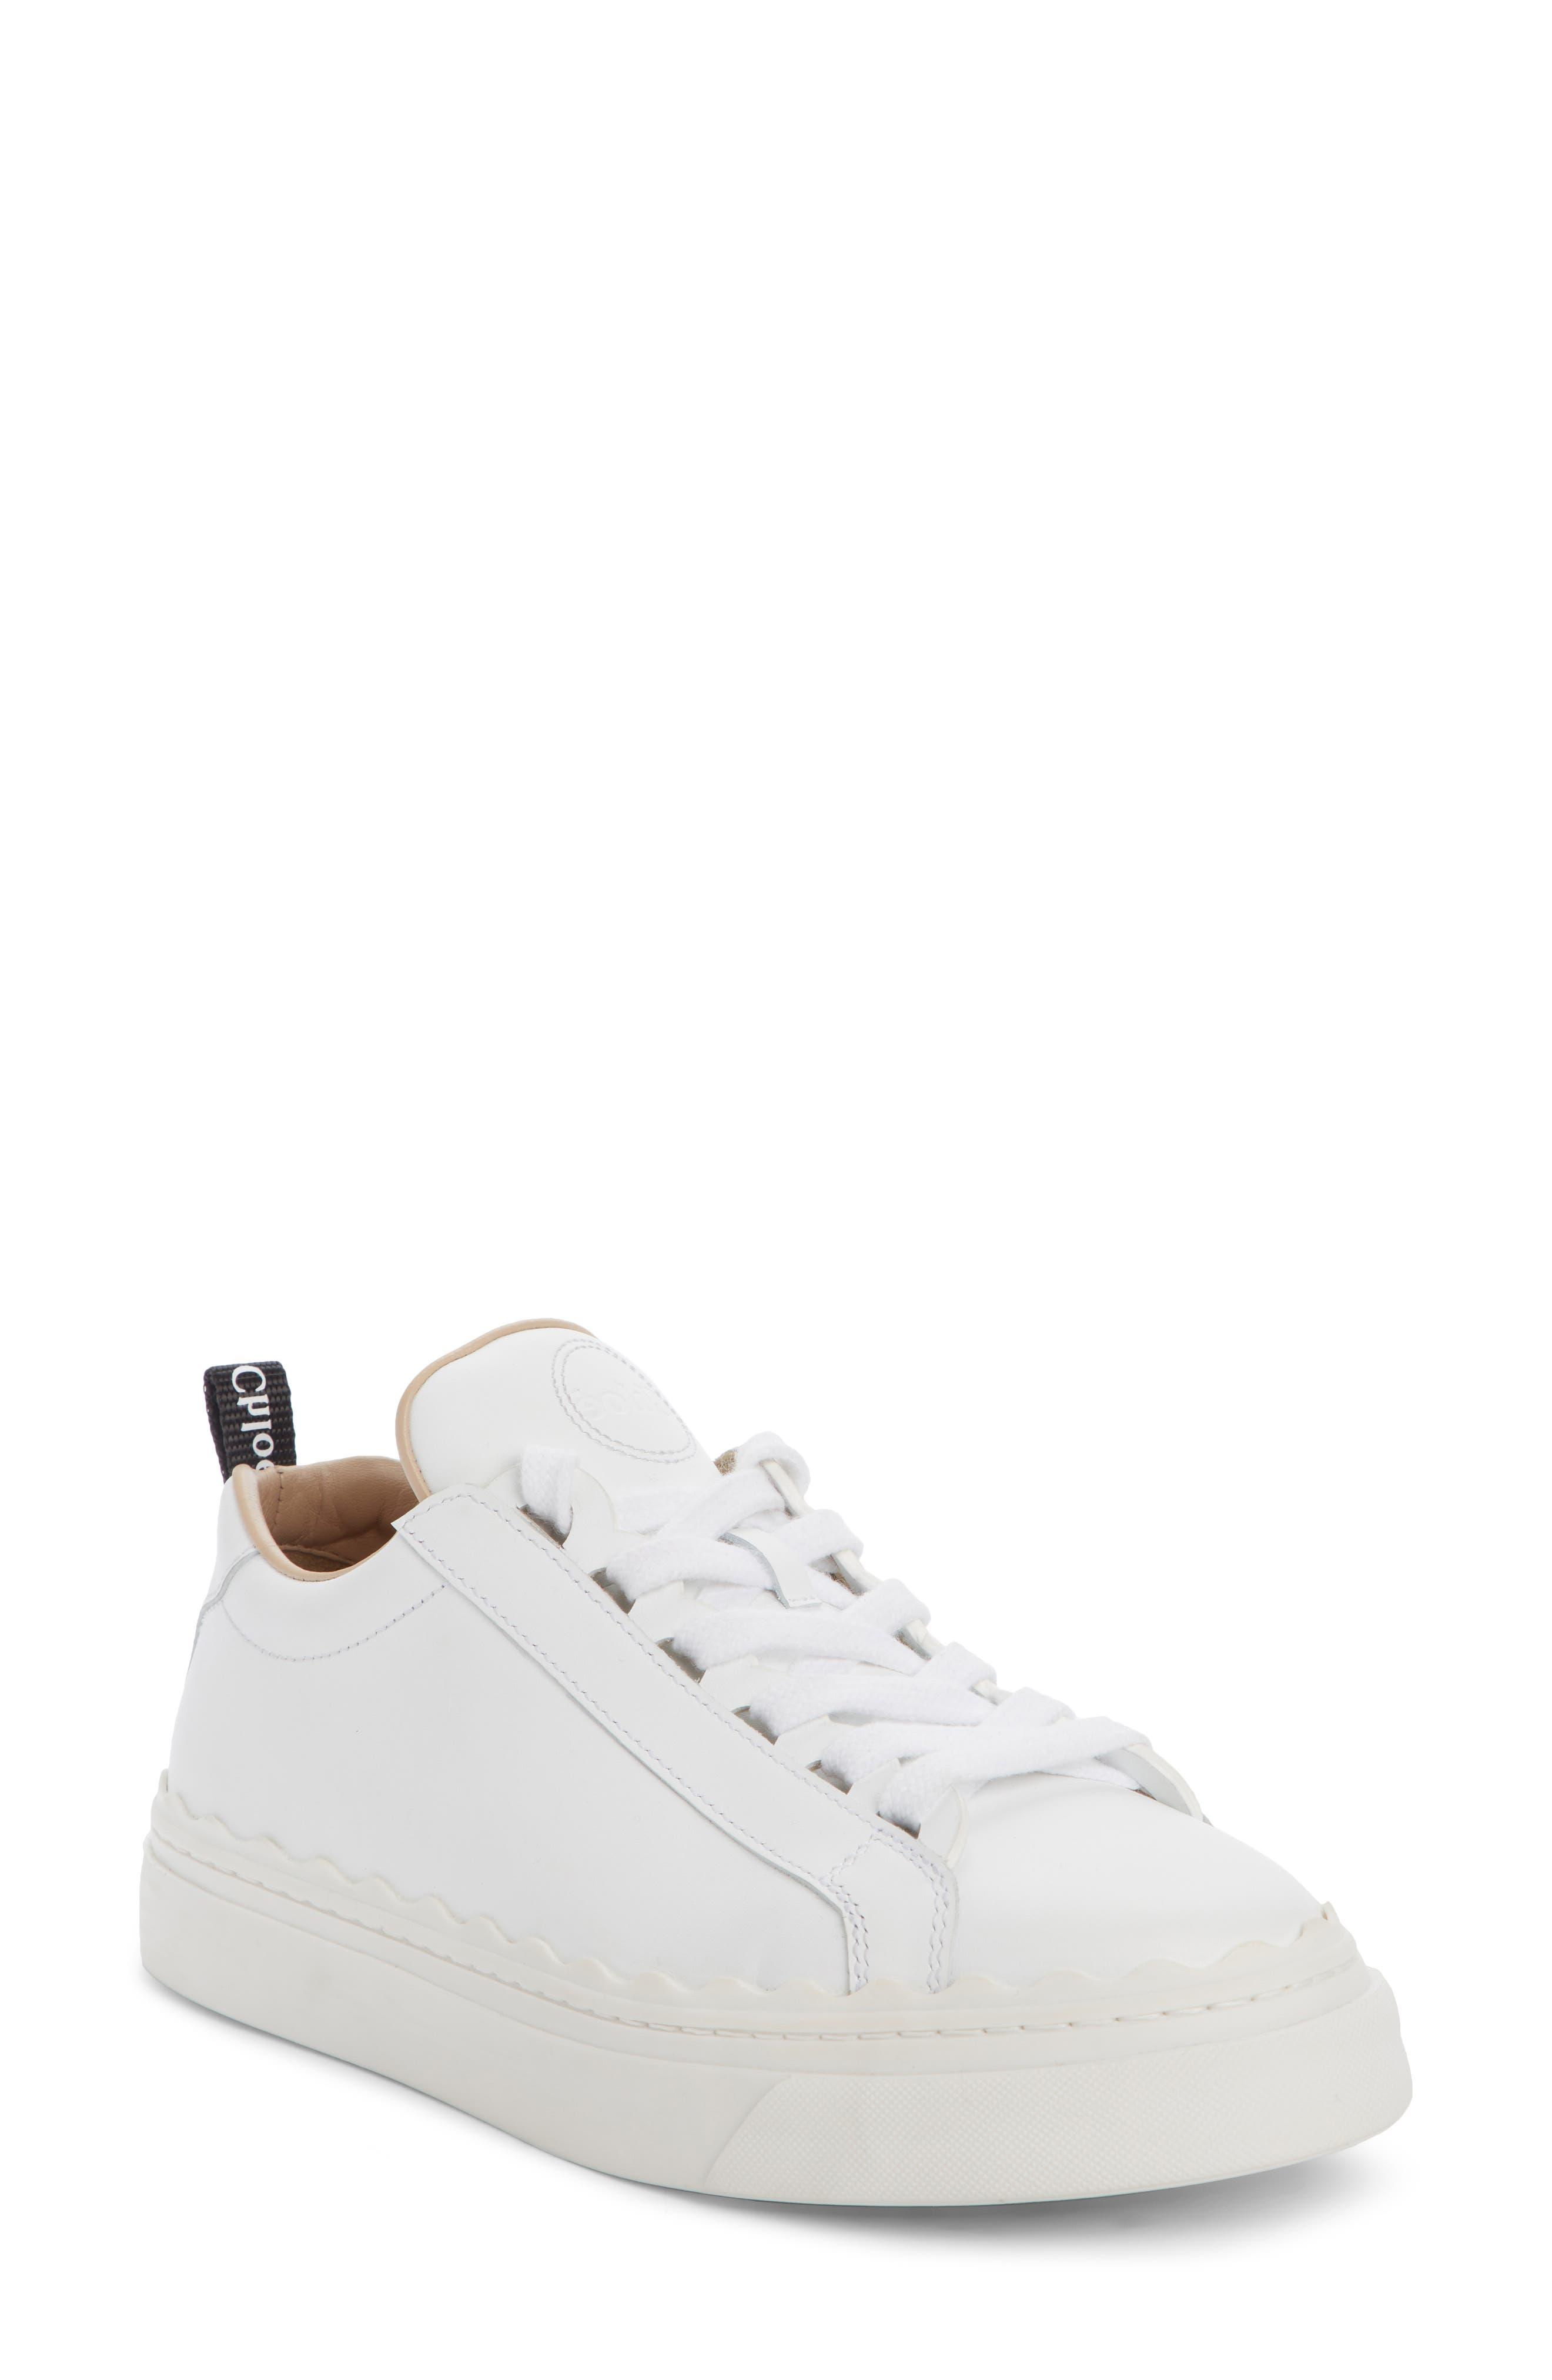 Lauren Sneaker,                         Main,                         color, WHITE LEATHER